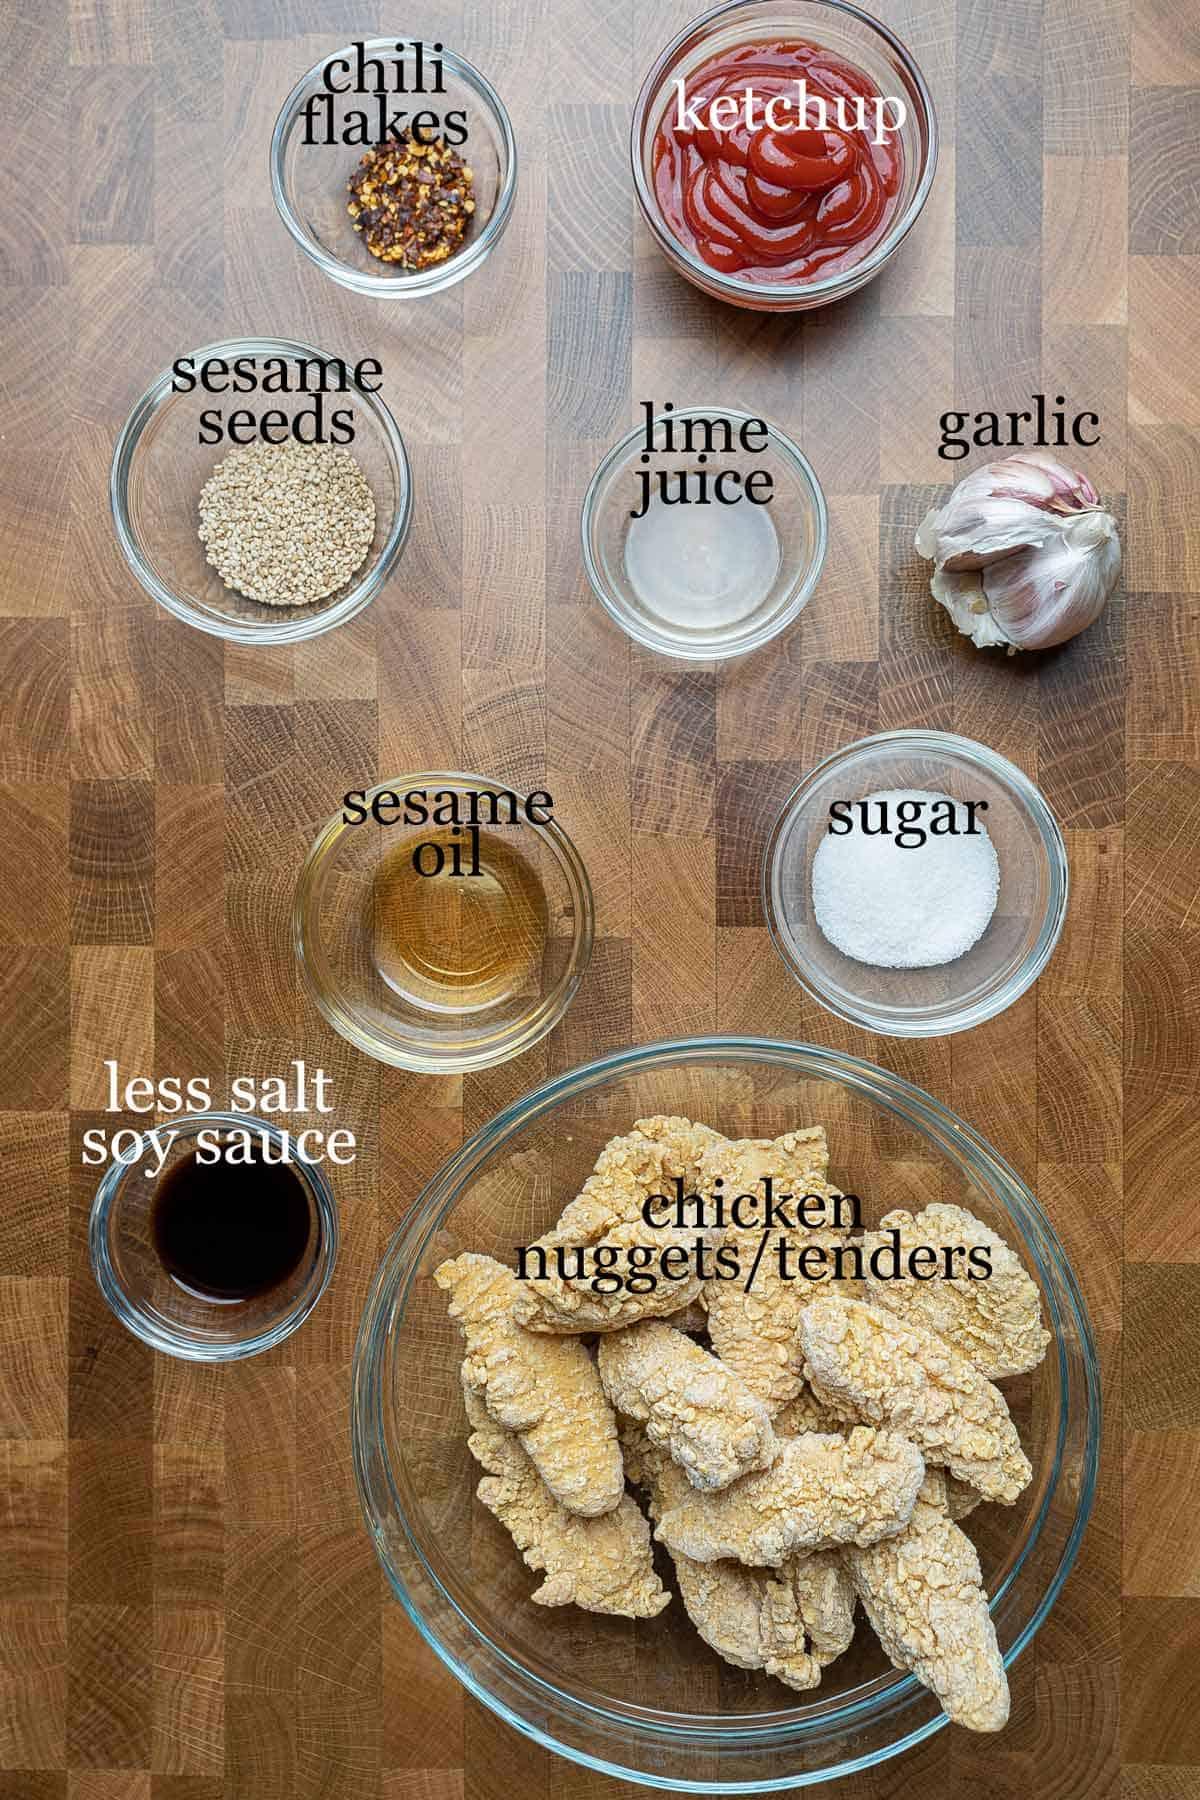 Ingredients to make crispy sesame chicken